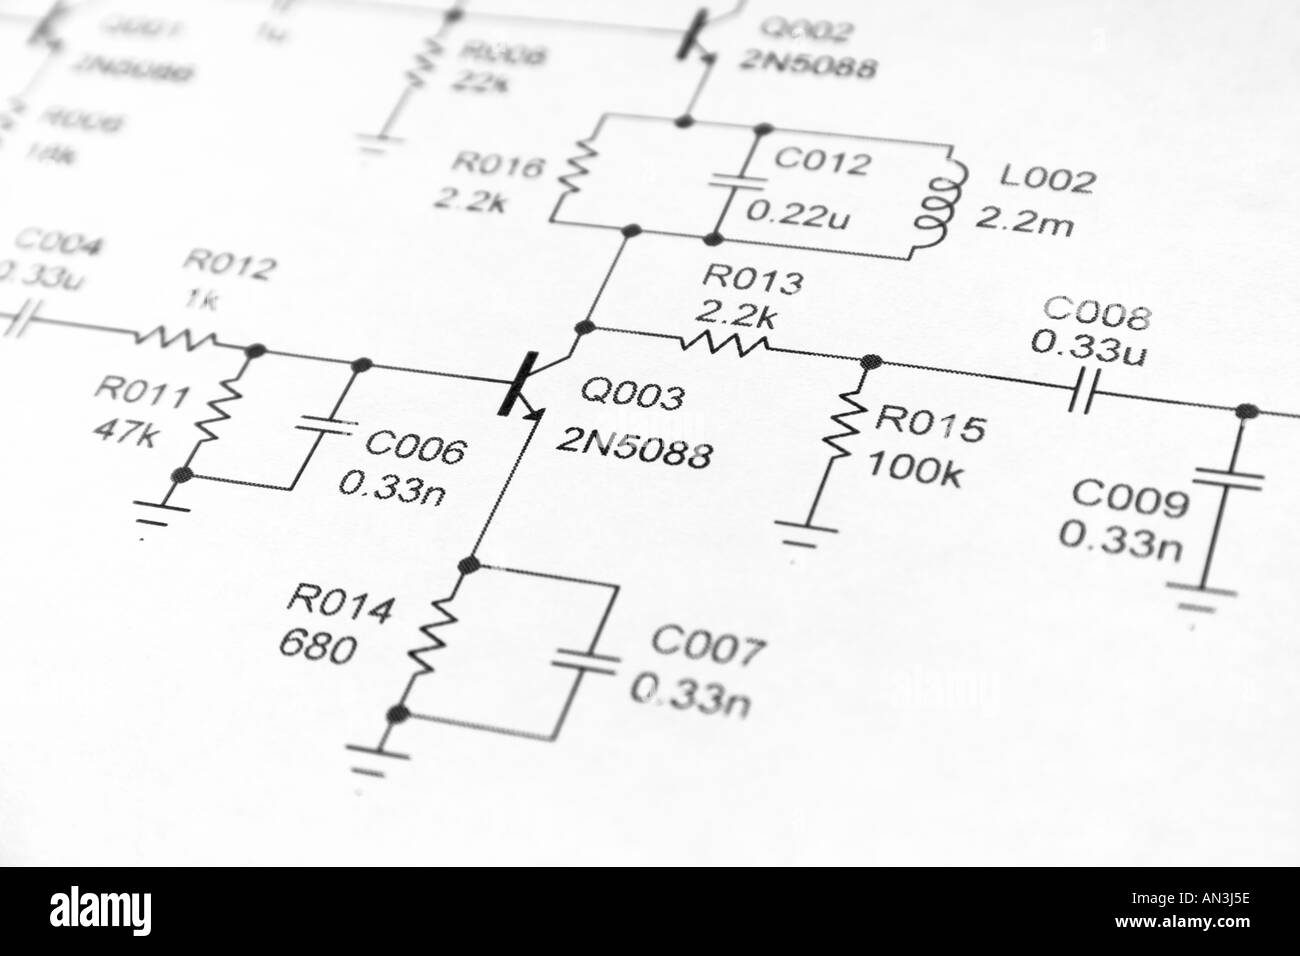 Nahaufnahme von Elektronik Schaltplan Stockfoto, Bild: 5027421 - Alamy